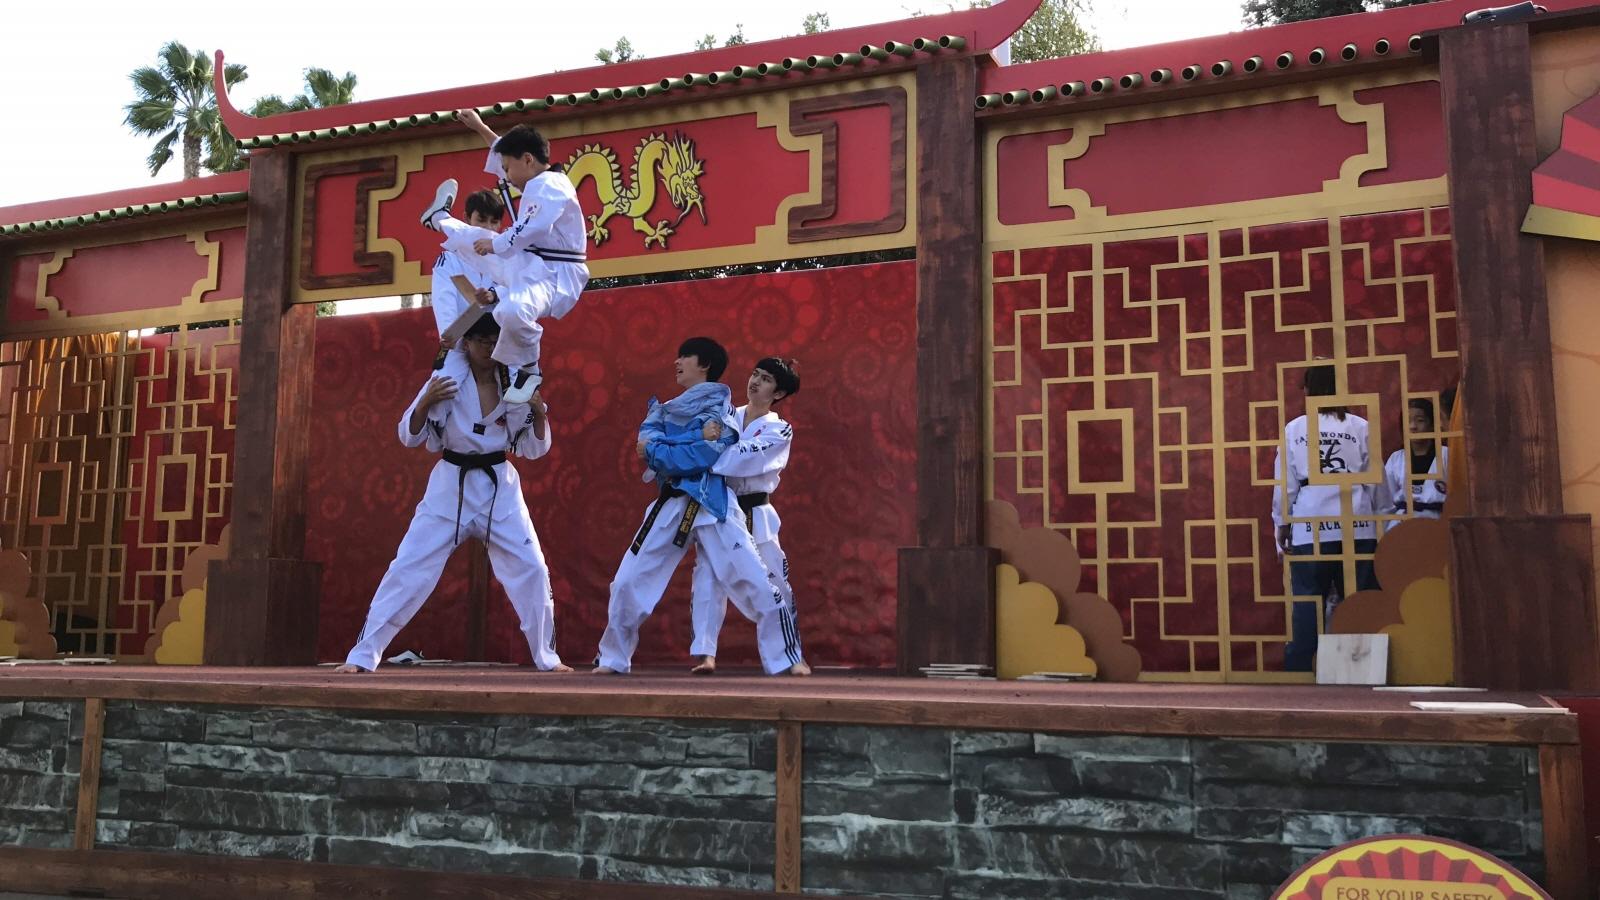 Taekwondo San Diego